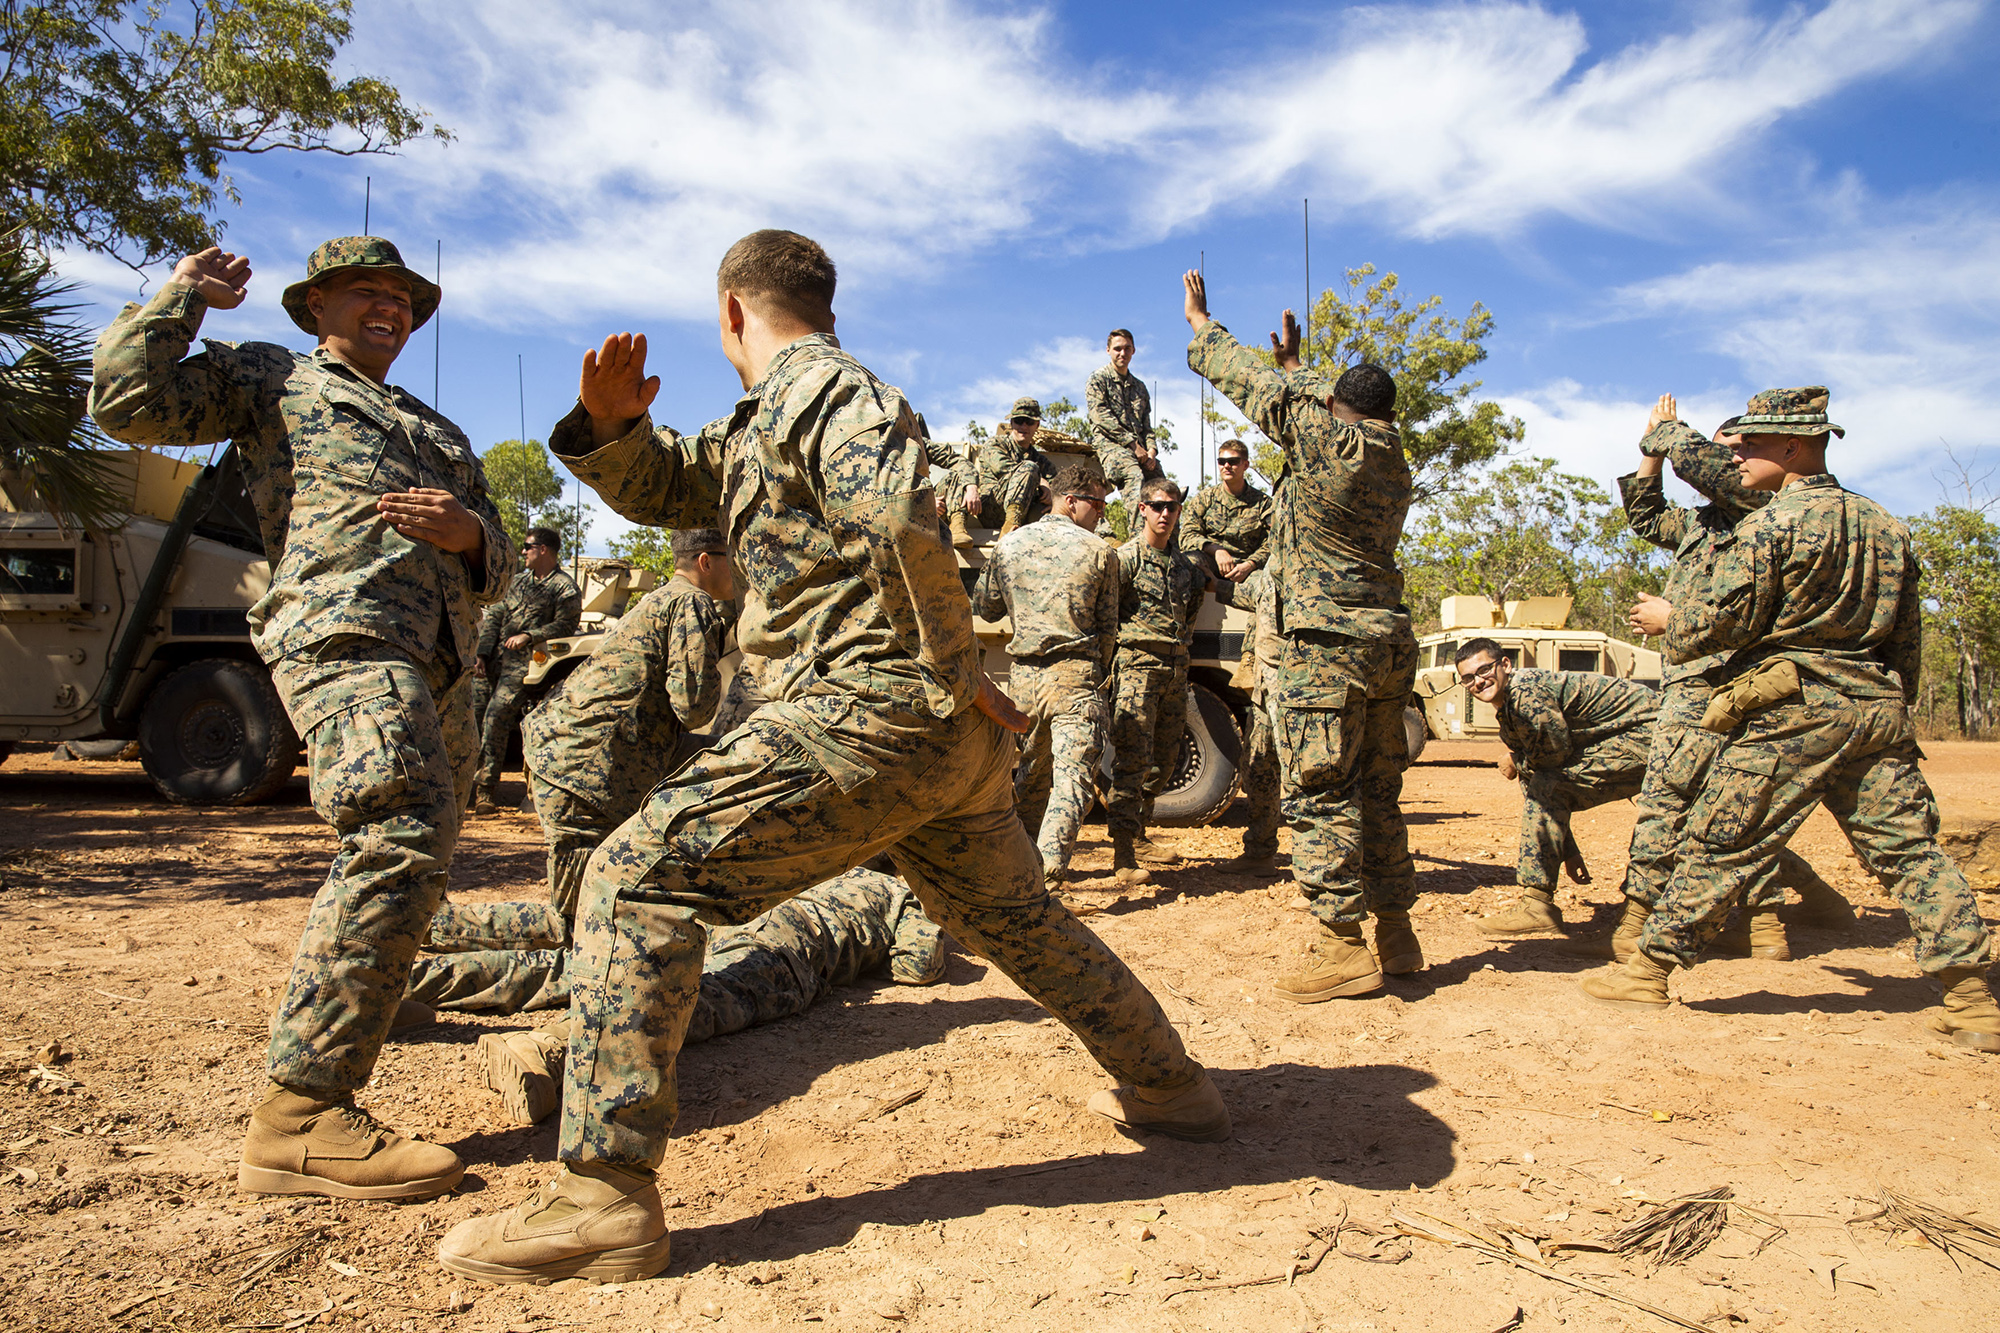 U.S. Marine Corps Lance Cpls. Jarom Hofmann and Jonathan Steed take a break from training at Kangaroo Flats Training Area, Northern Territory, Australia, July 27, 2020. (Cpl. Harrison Rakhshani/Marine Corps)